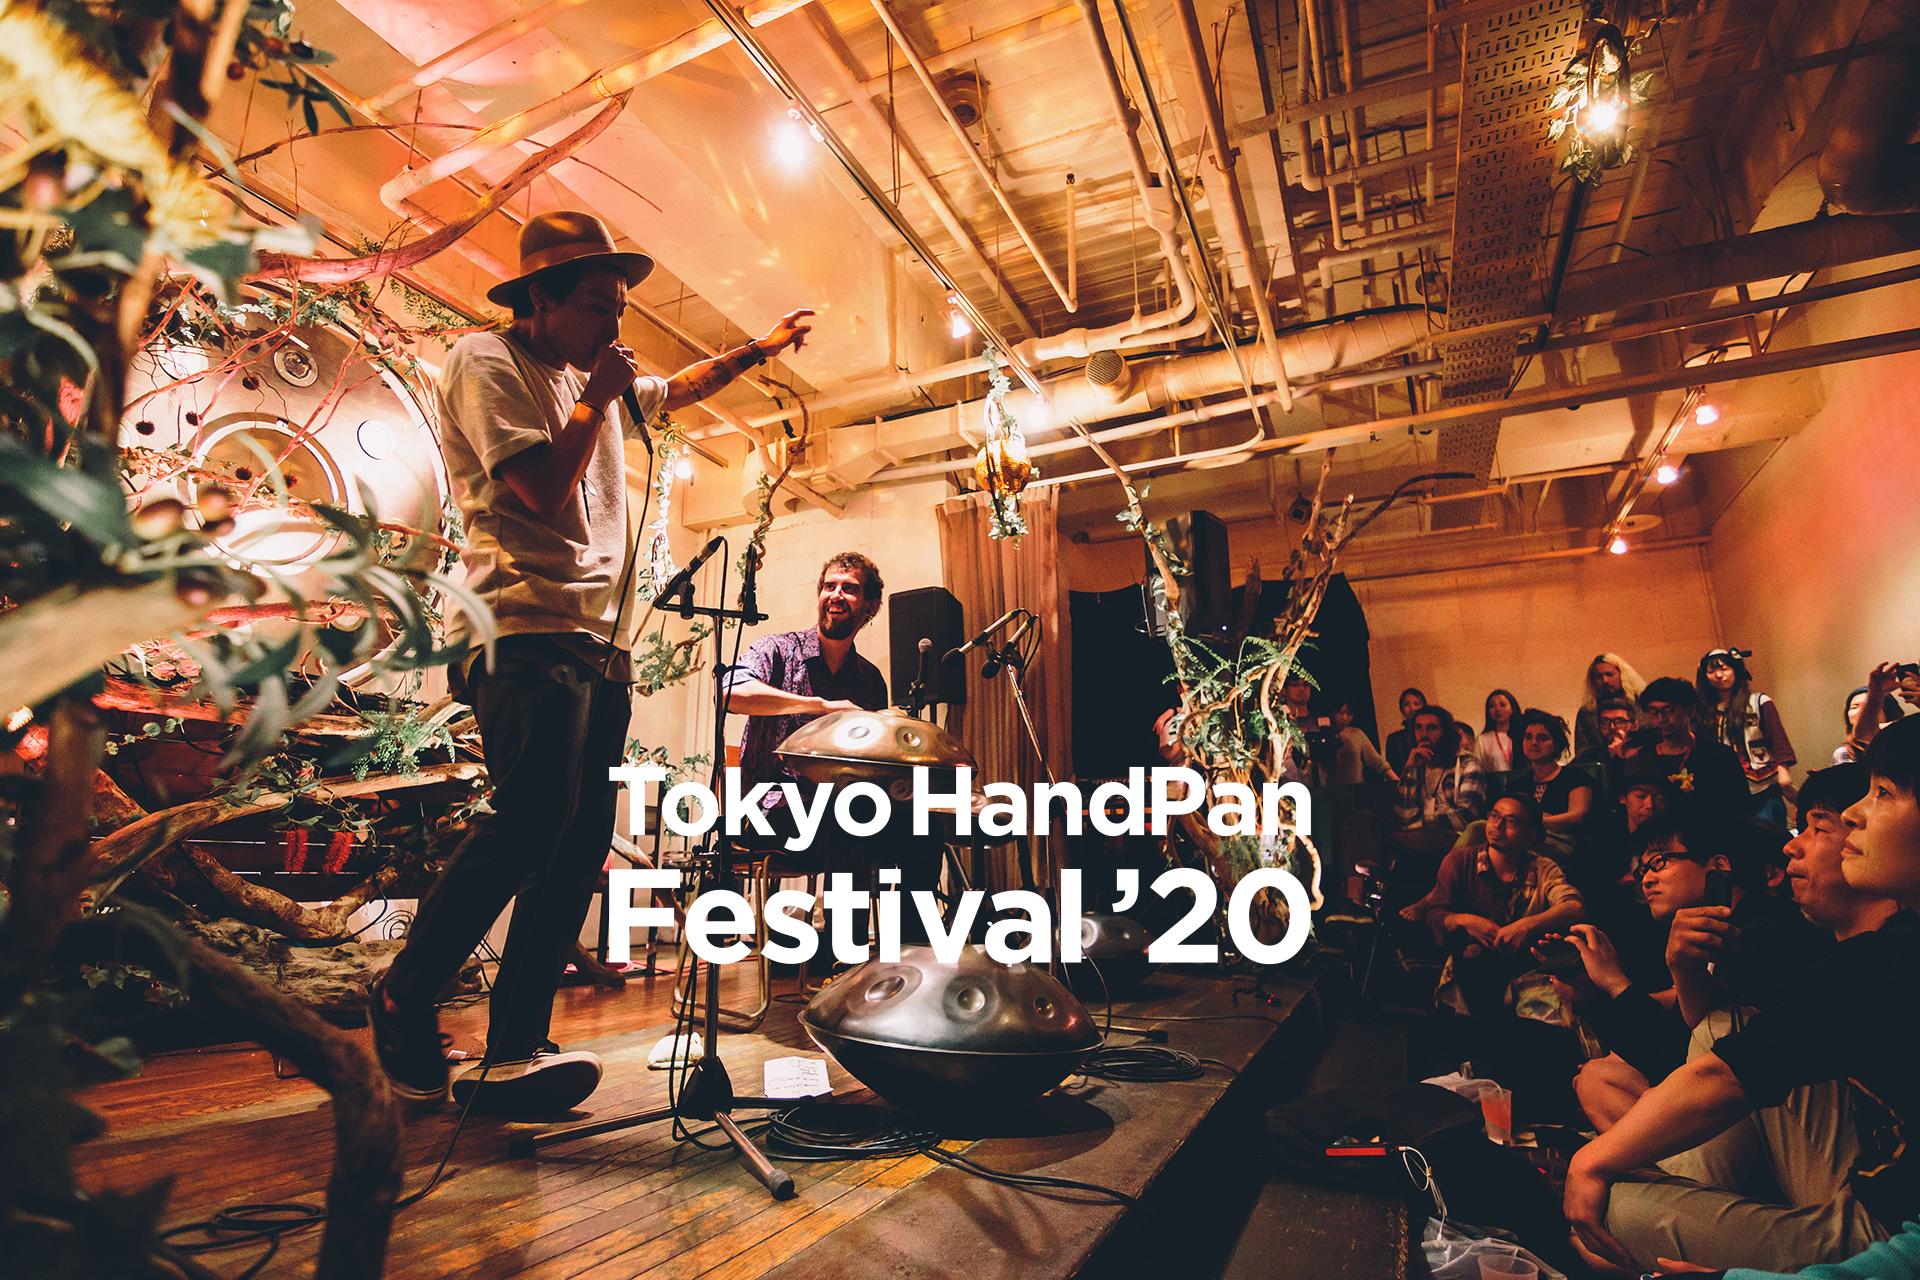 Tokyo HandPan Festival '20